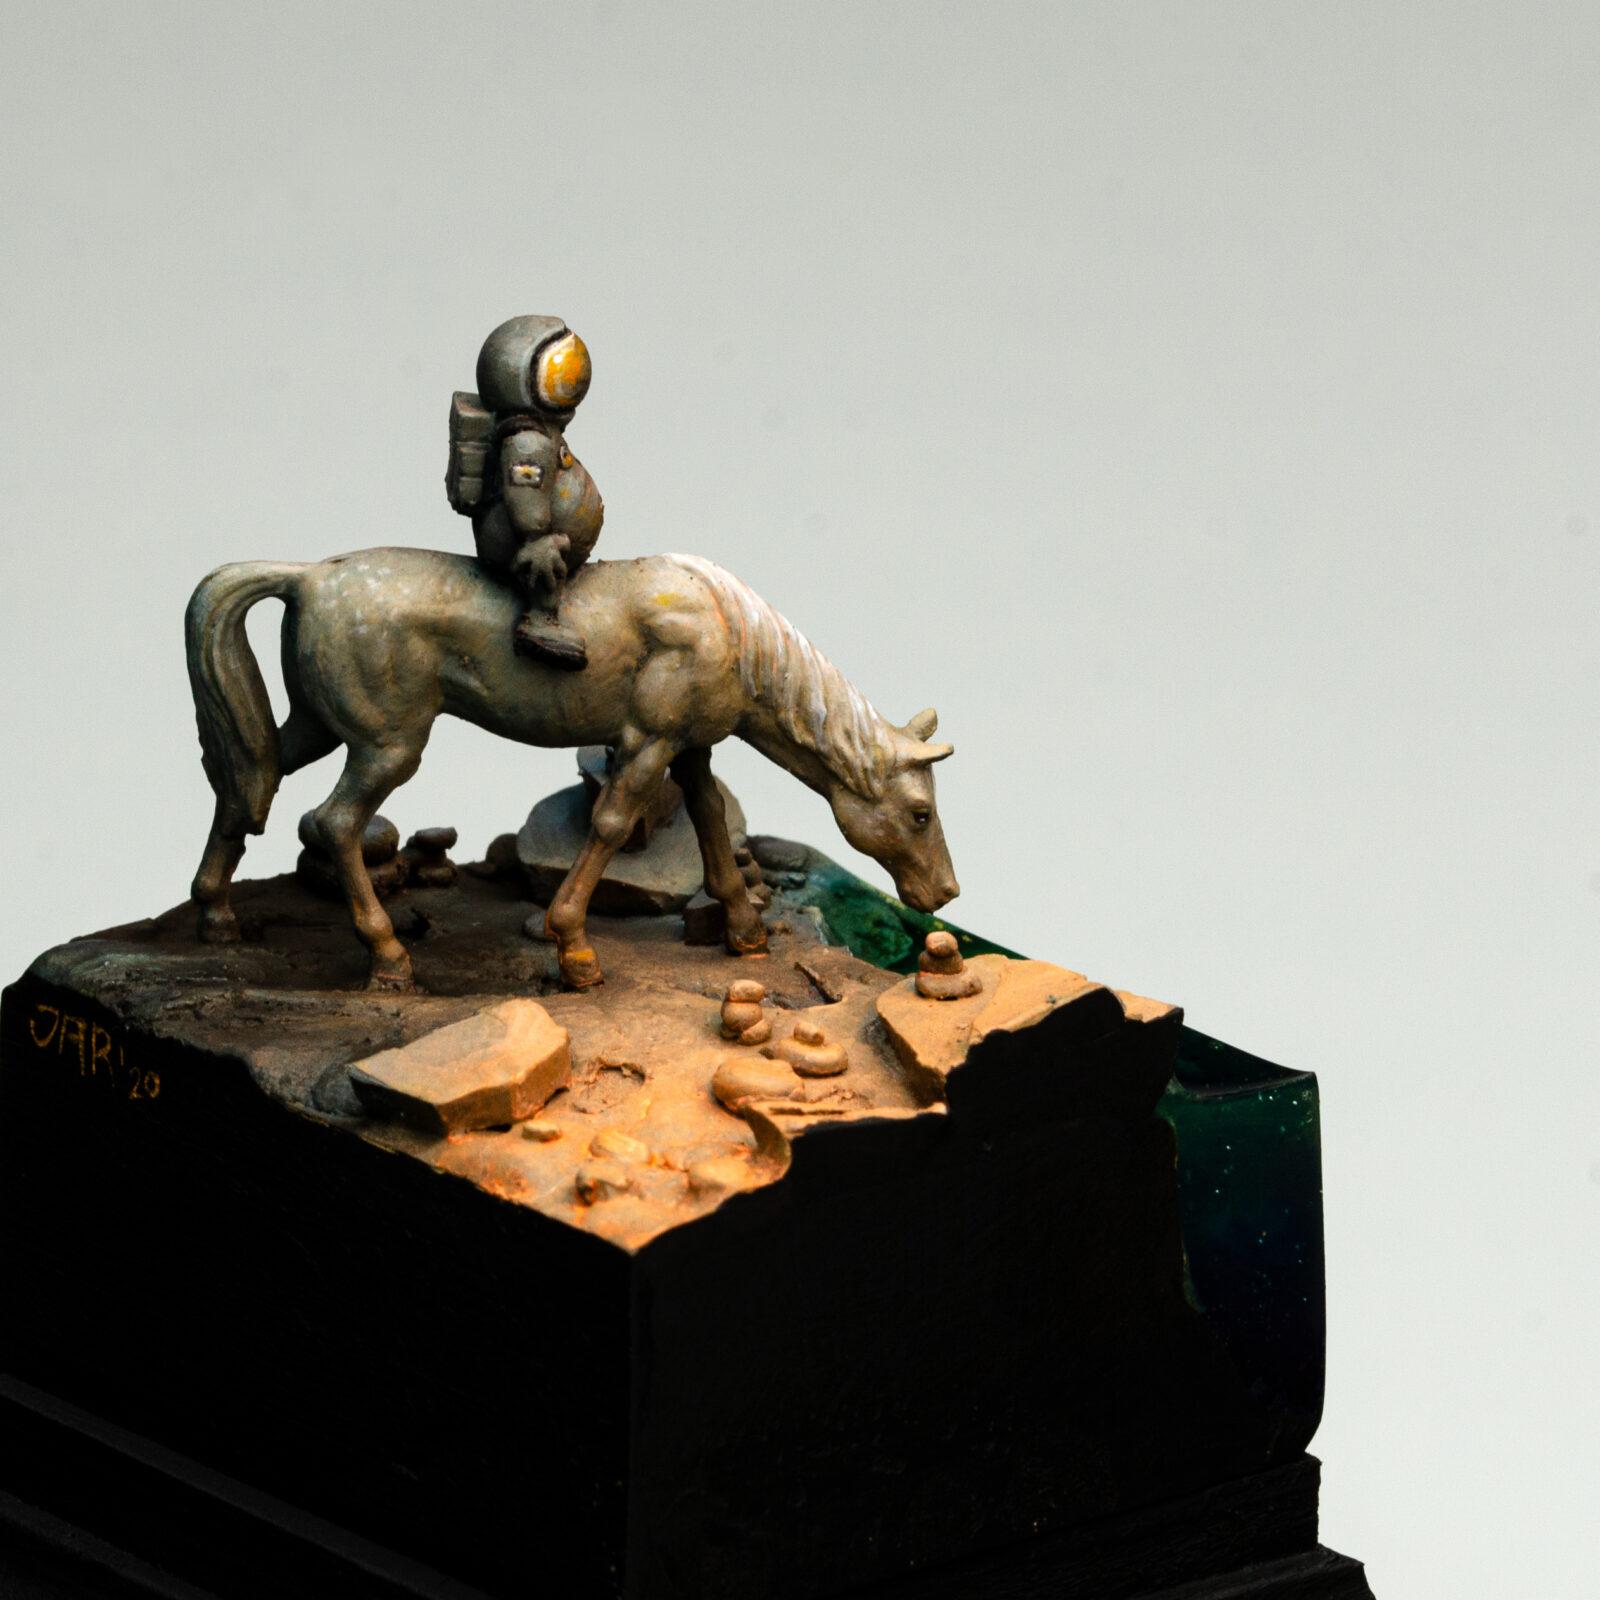 Palehorse10